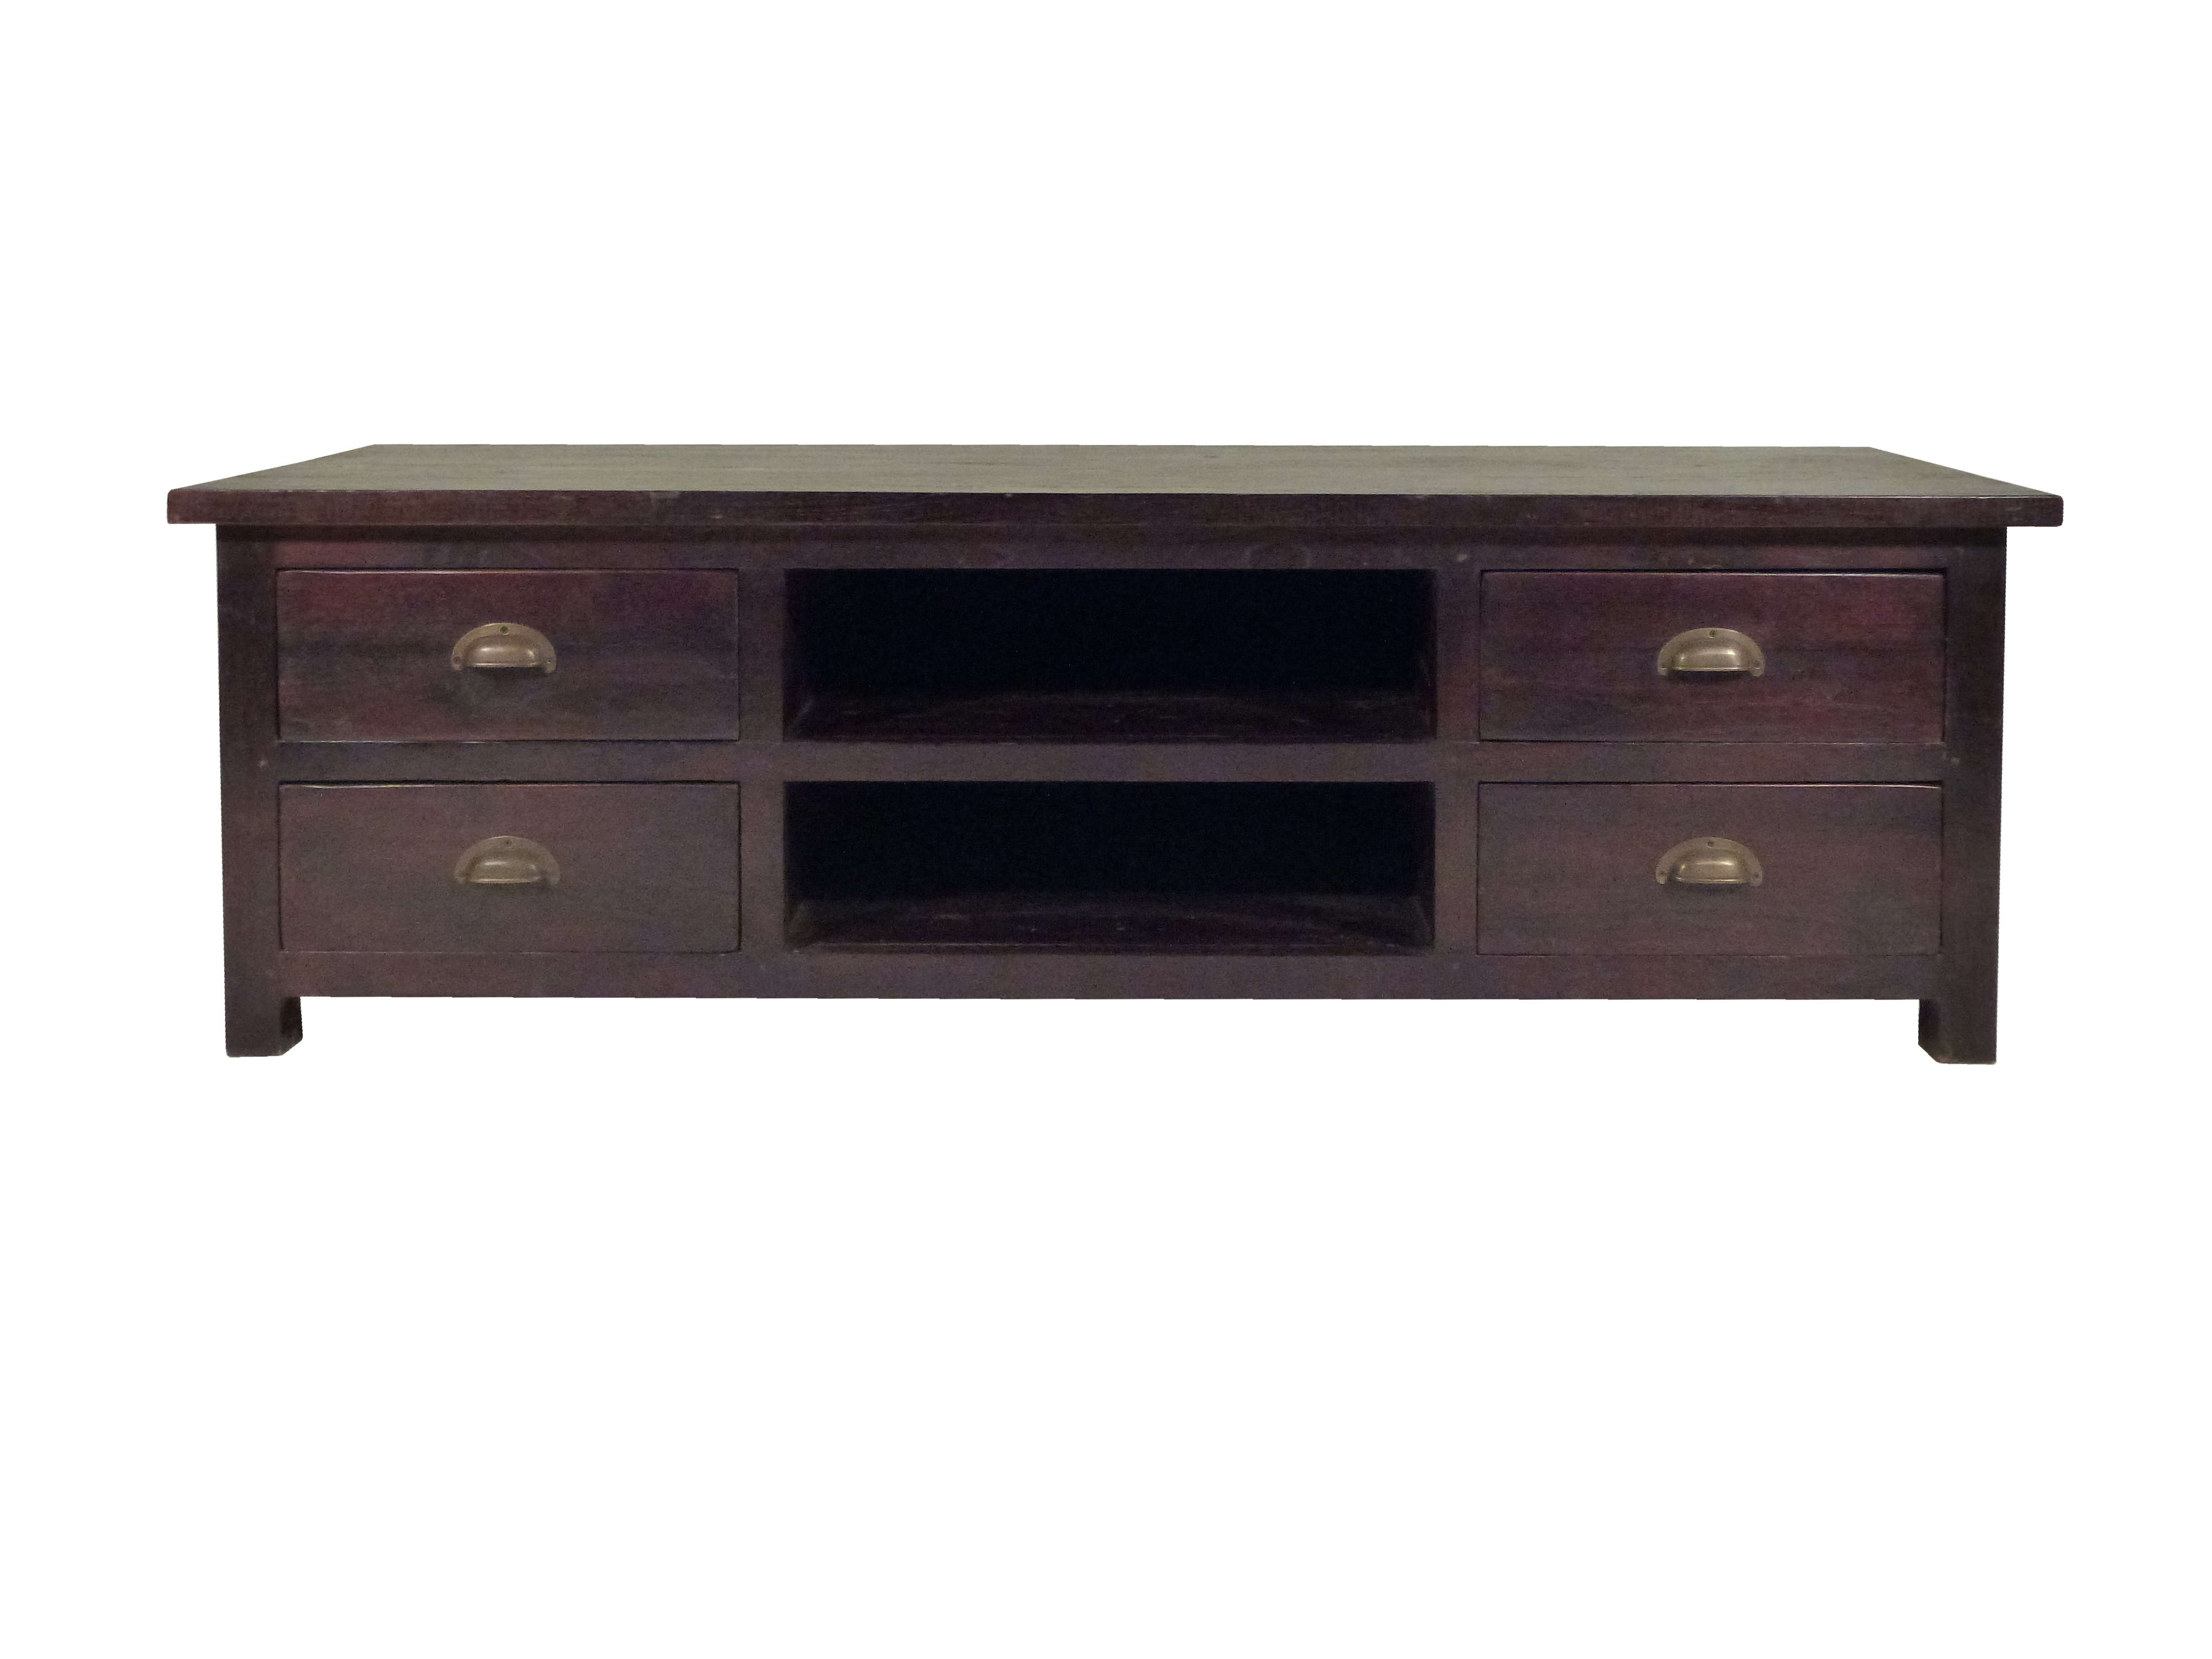 Koloniaal Tv Meubel : Koloniaal tv dressoir met 2 open vakken en 4 lades ajc meubelen